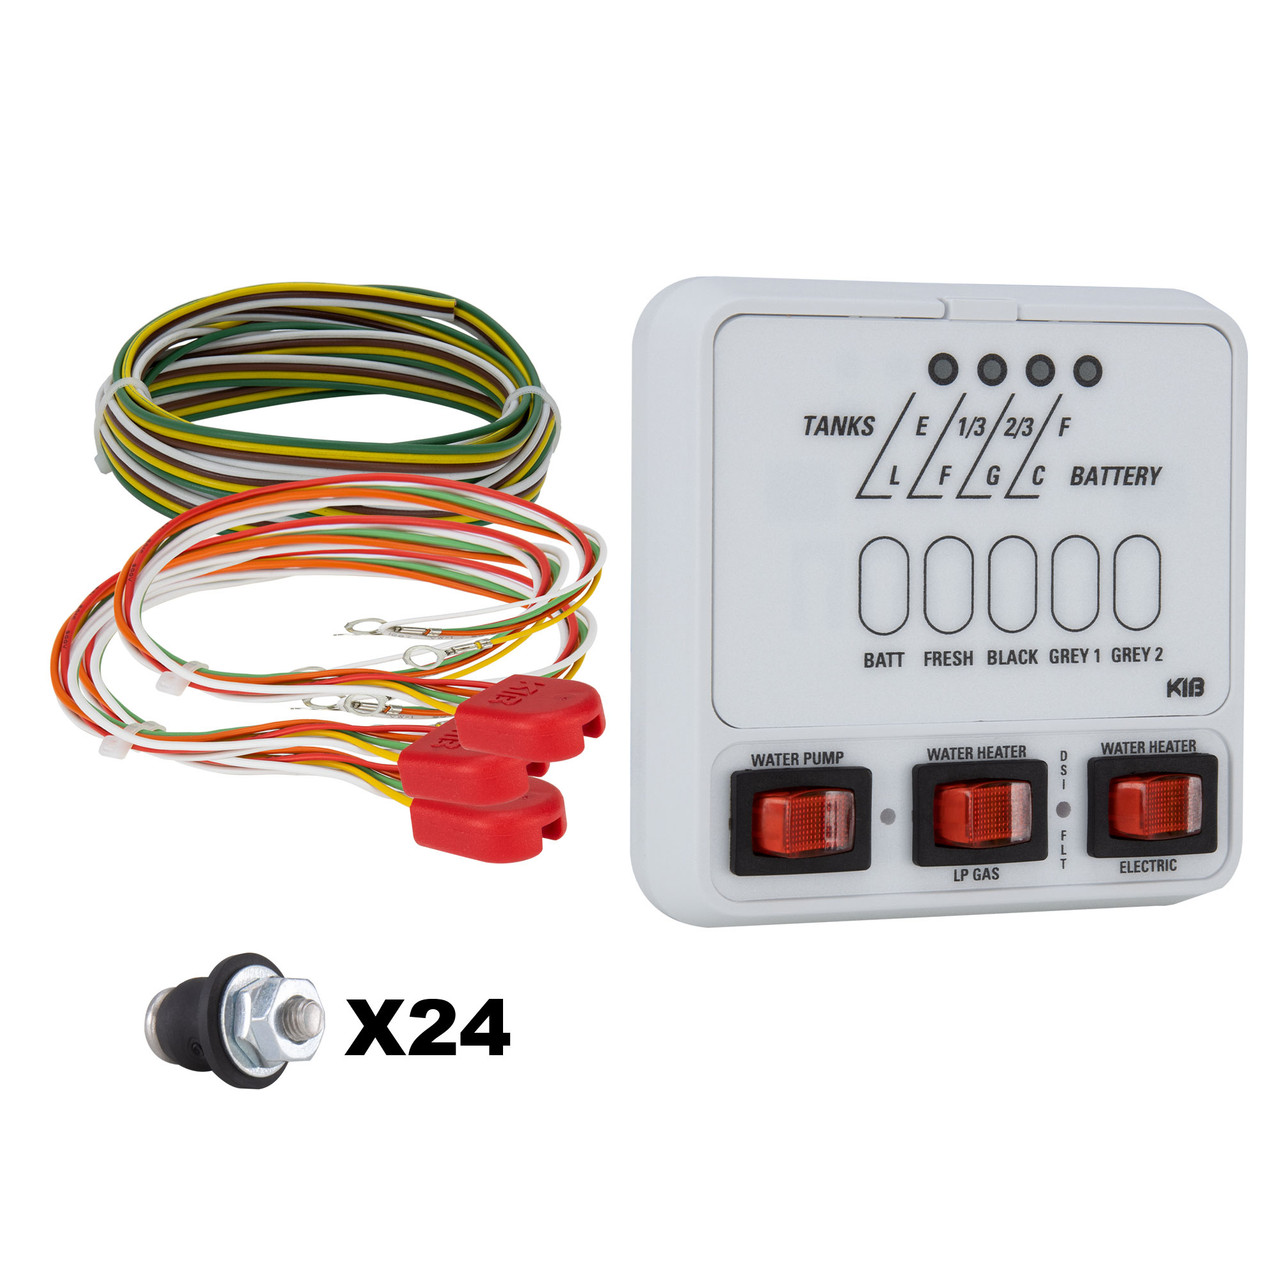 RV KIB Tank Sensor Monitor Panel M25 with Wiring Harness Kit - RecProRecPro